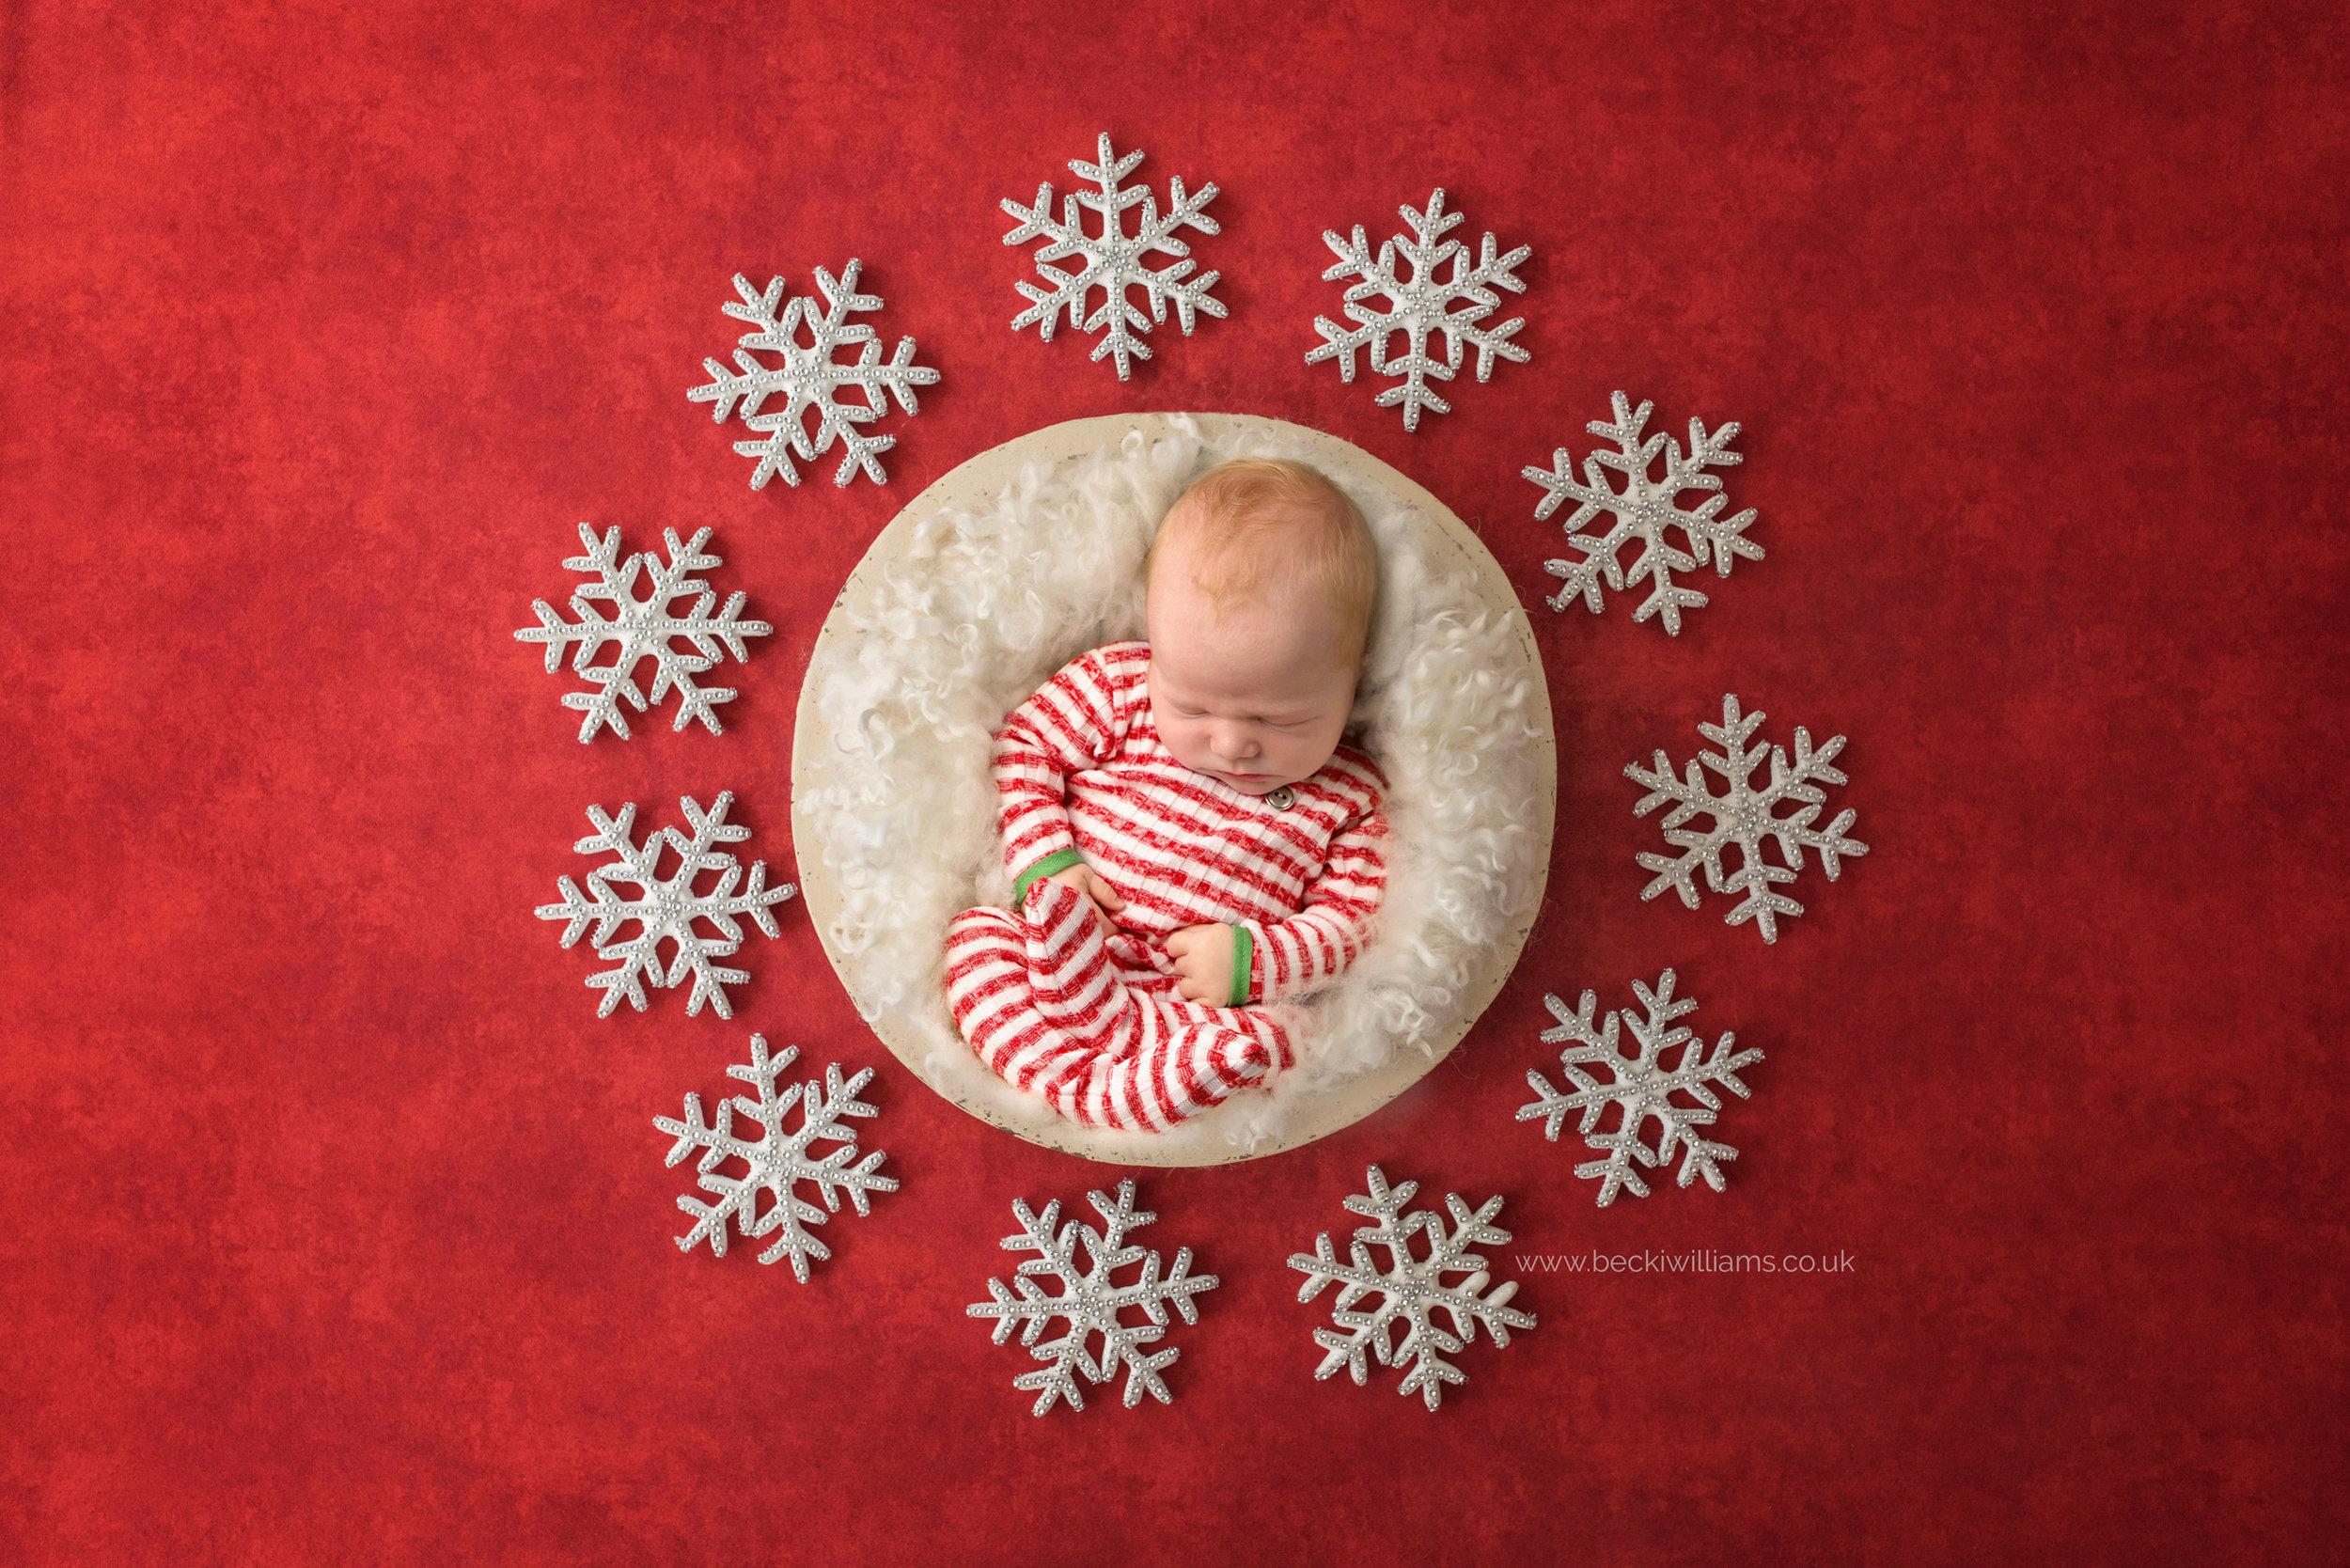 newborn-boy-portraits-hemel-hempstead-christmas-digital-background-red-snow.jpg